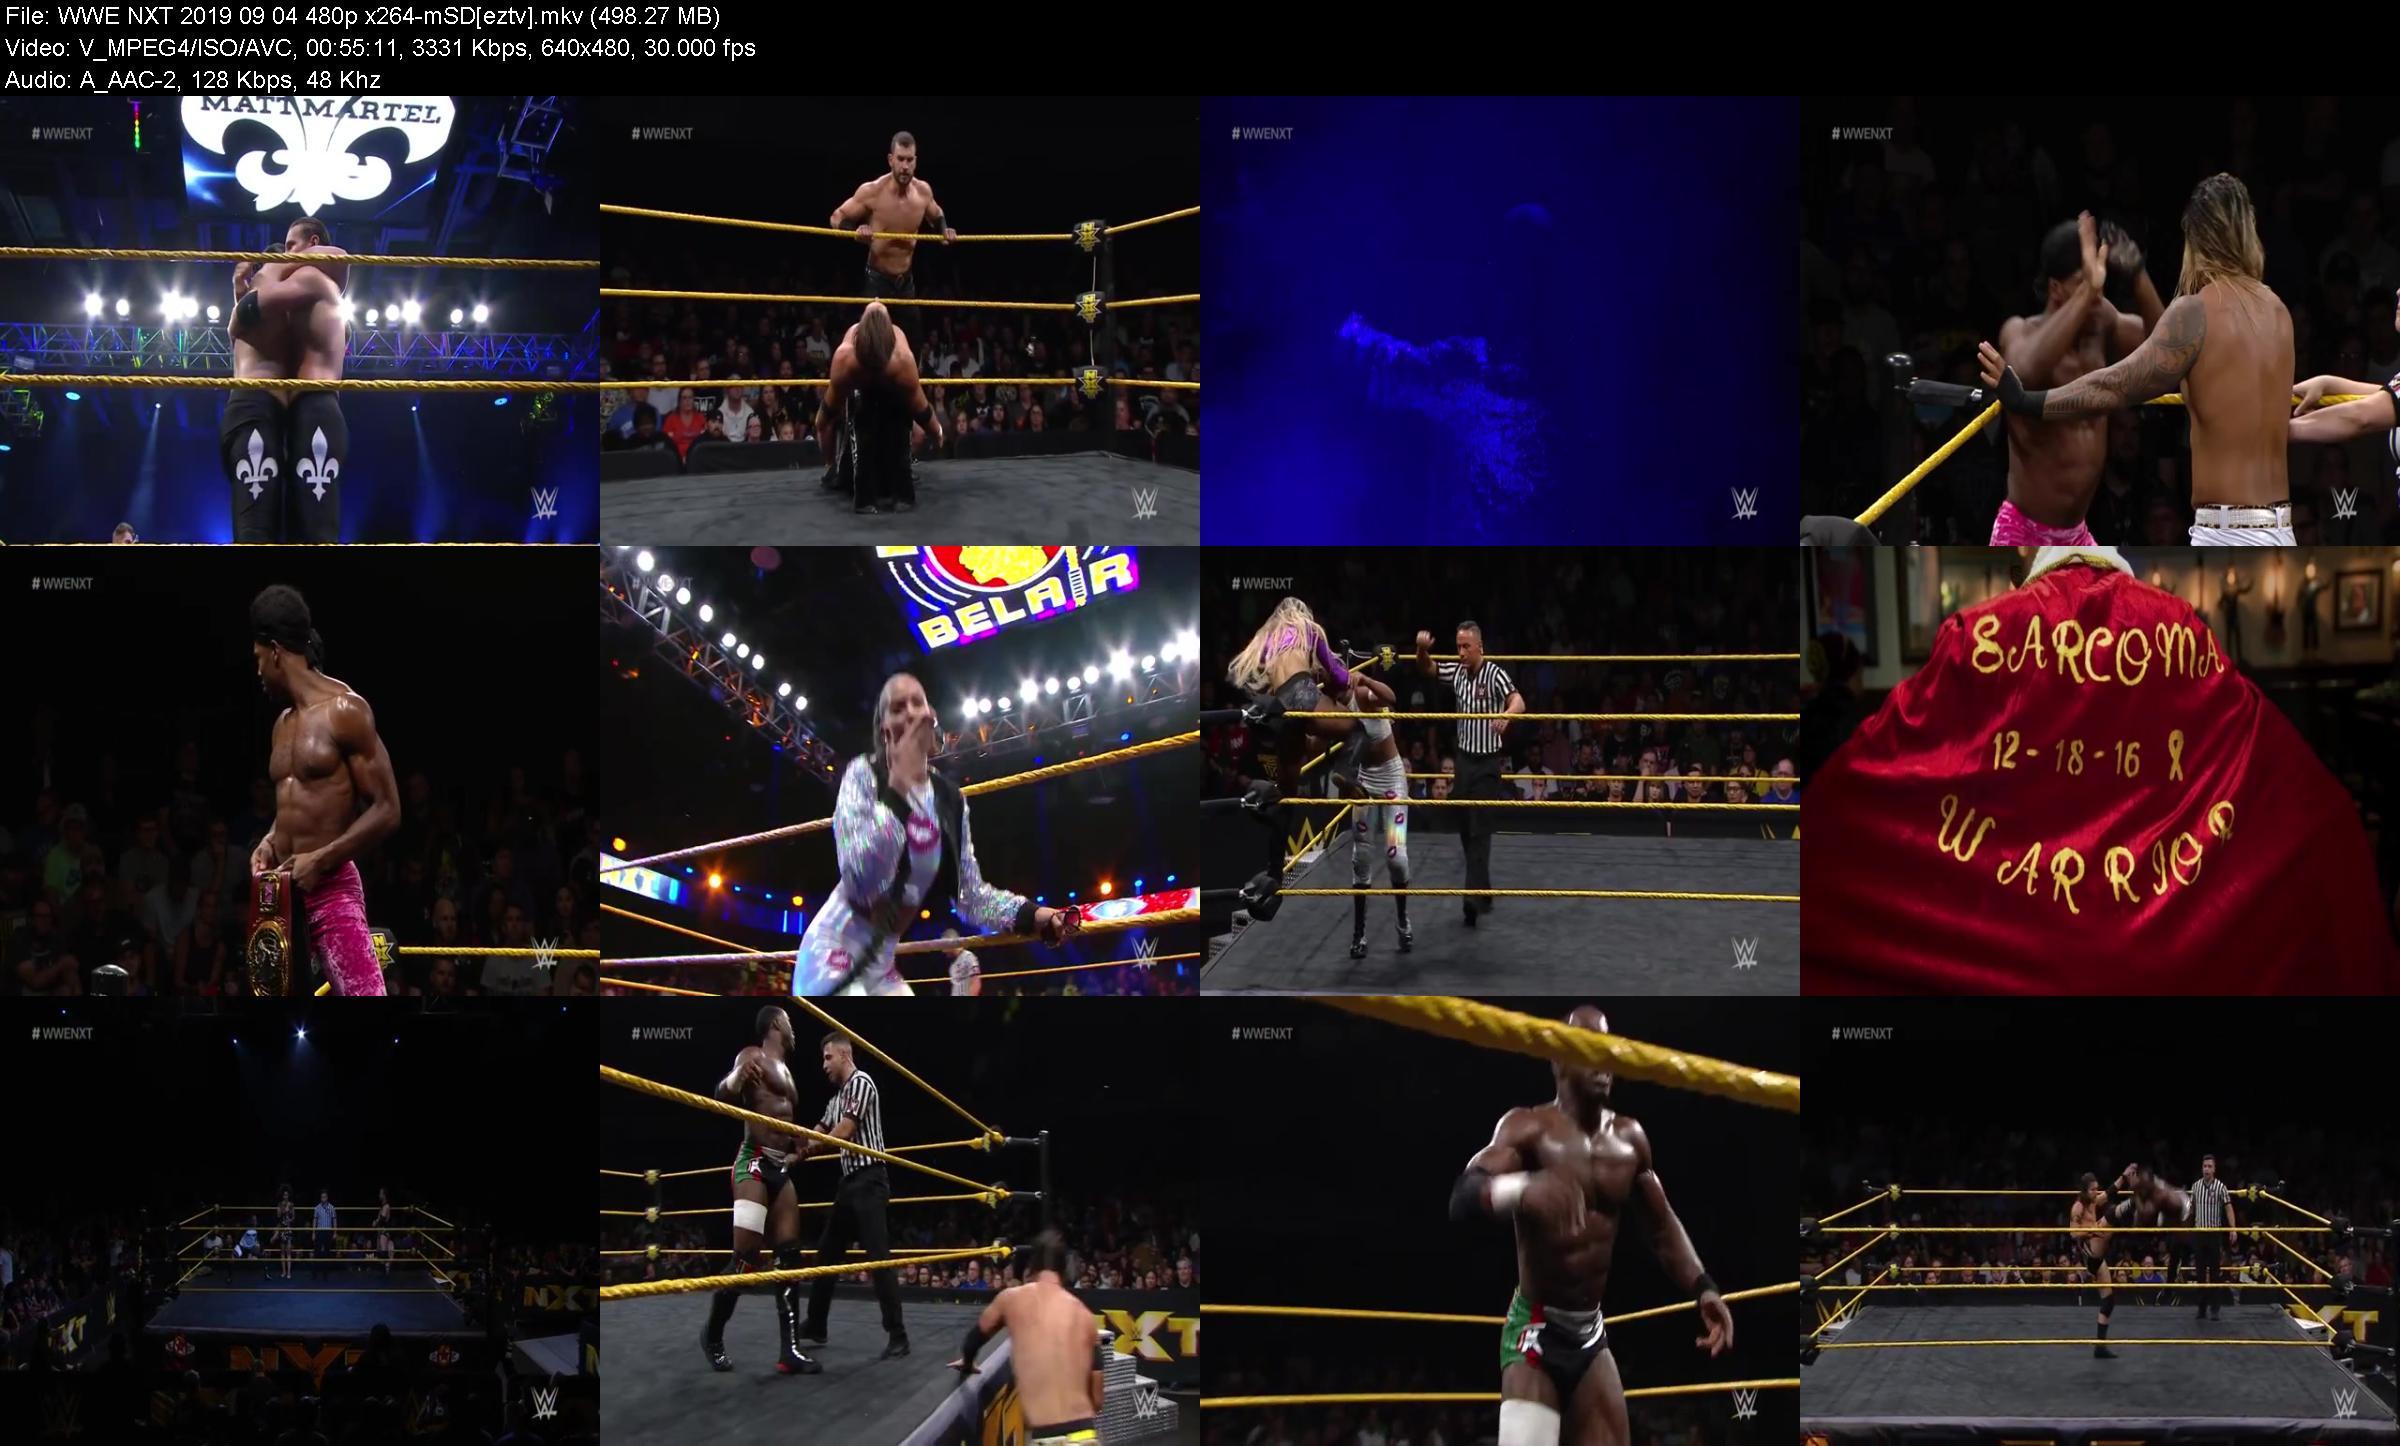 WWE NXT 2019 09 04 480p x264-mSD